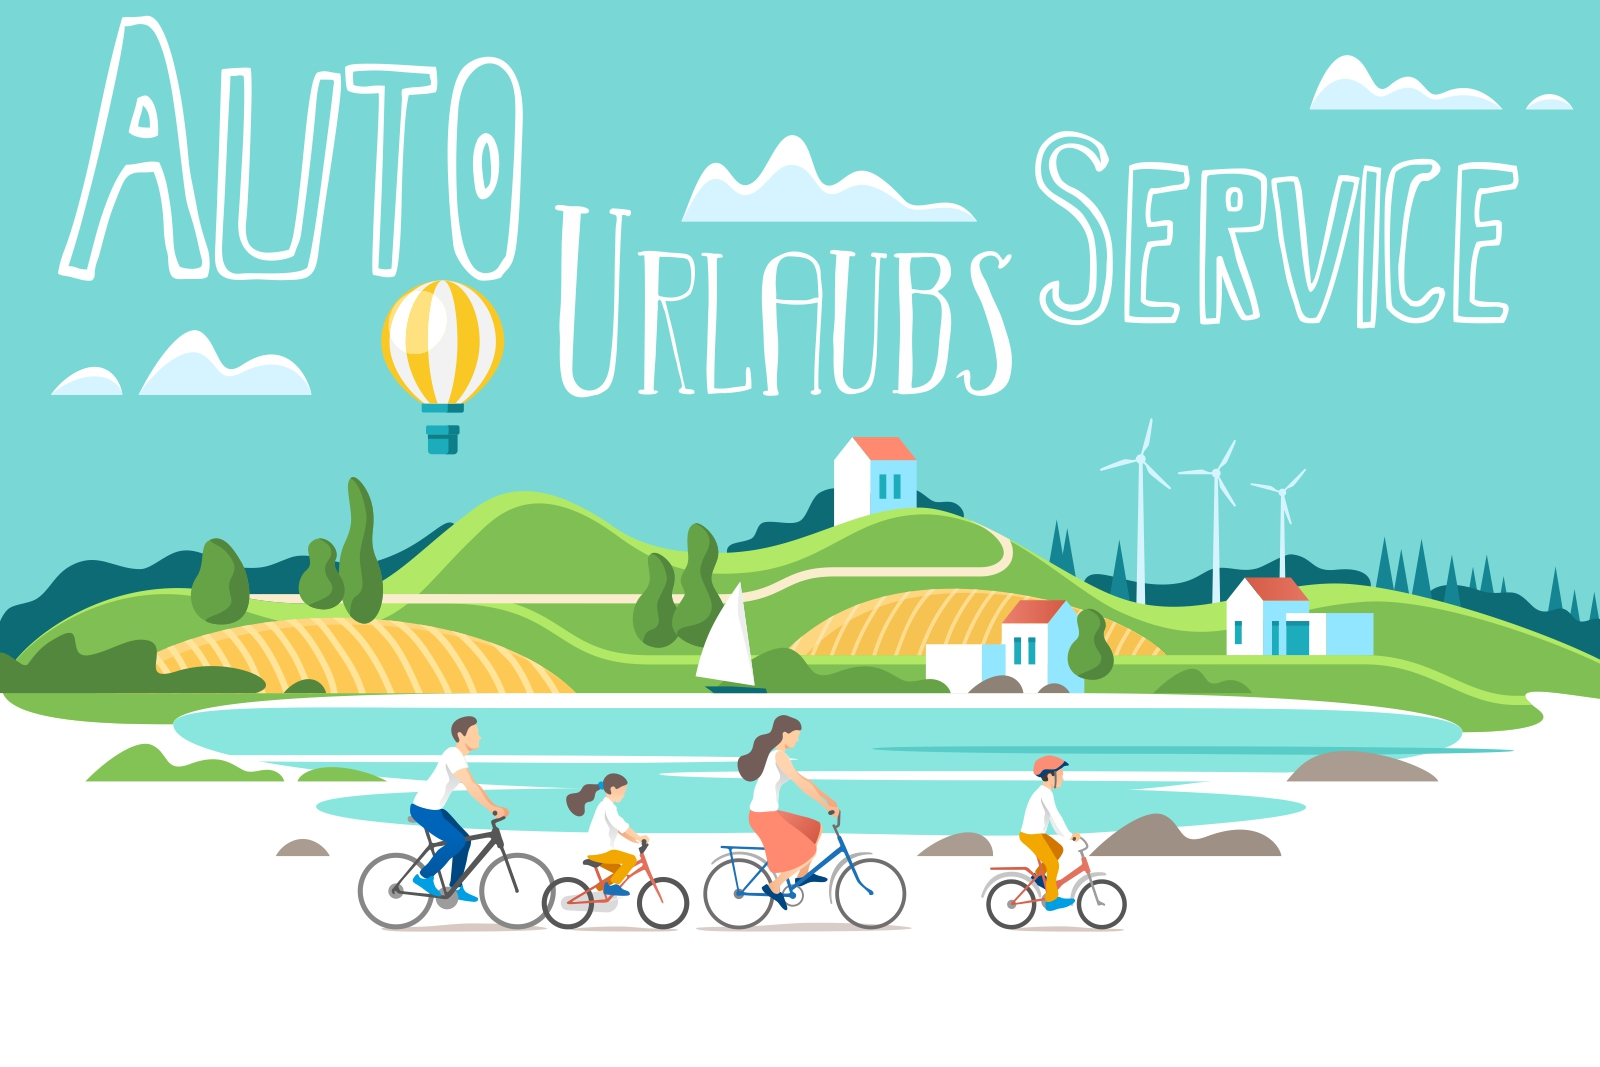 Auto-Partner-Büsum_Auto-Urlaubs-Service